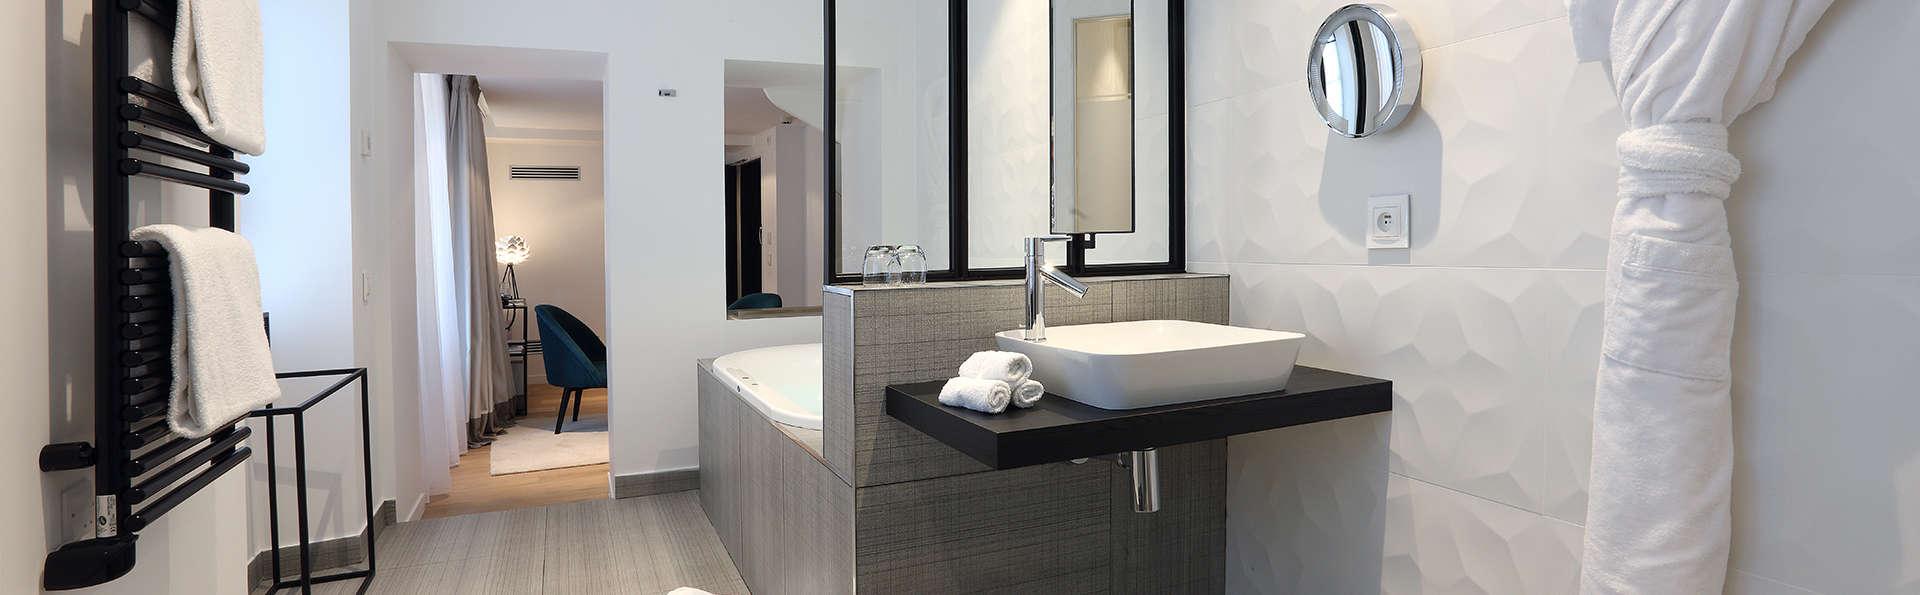 Petit Hôtel Confidentiel - Edit_Bathroom13.jpg